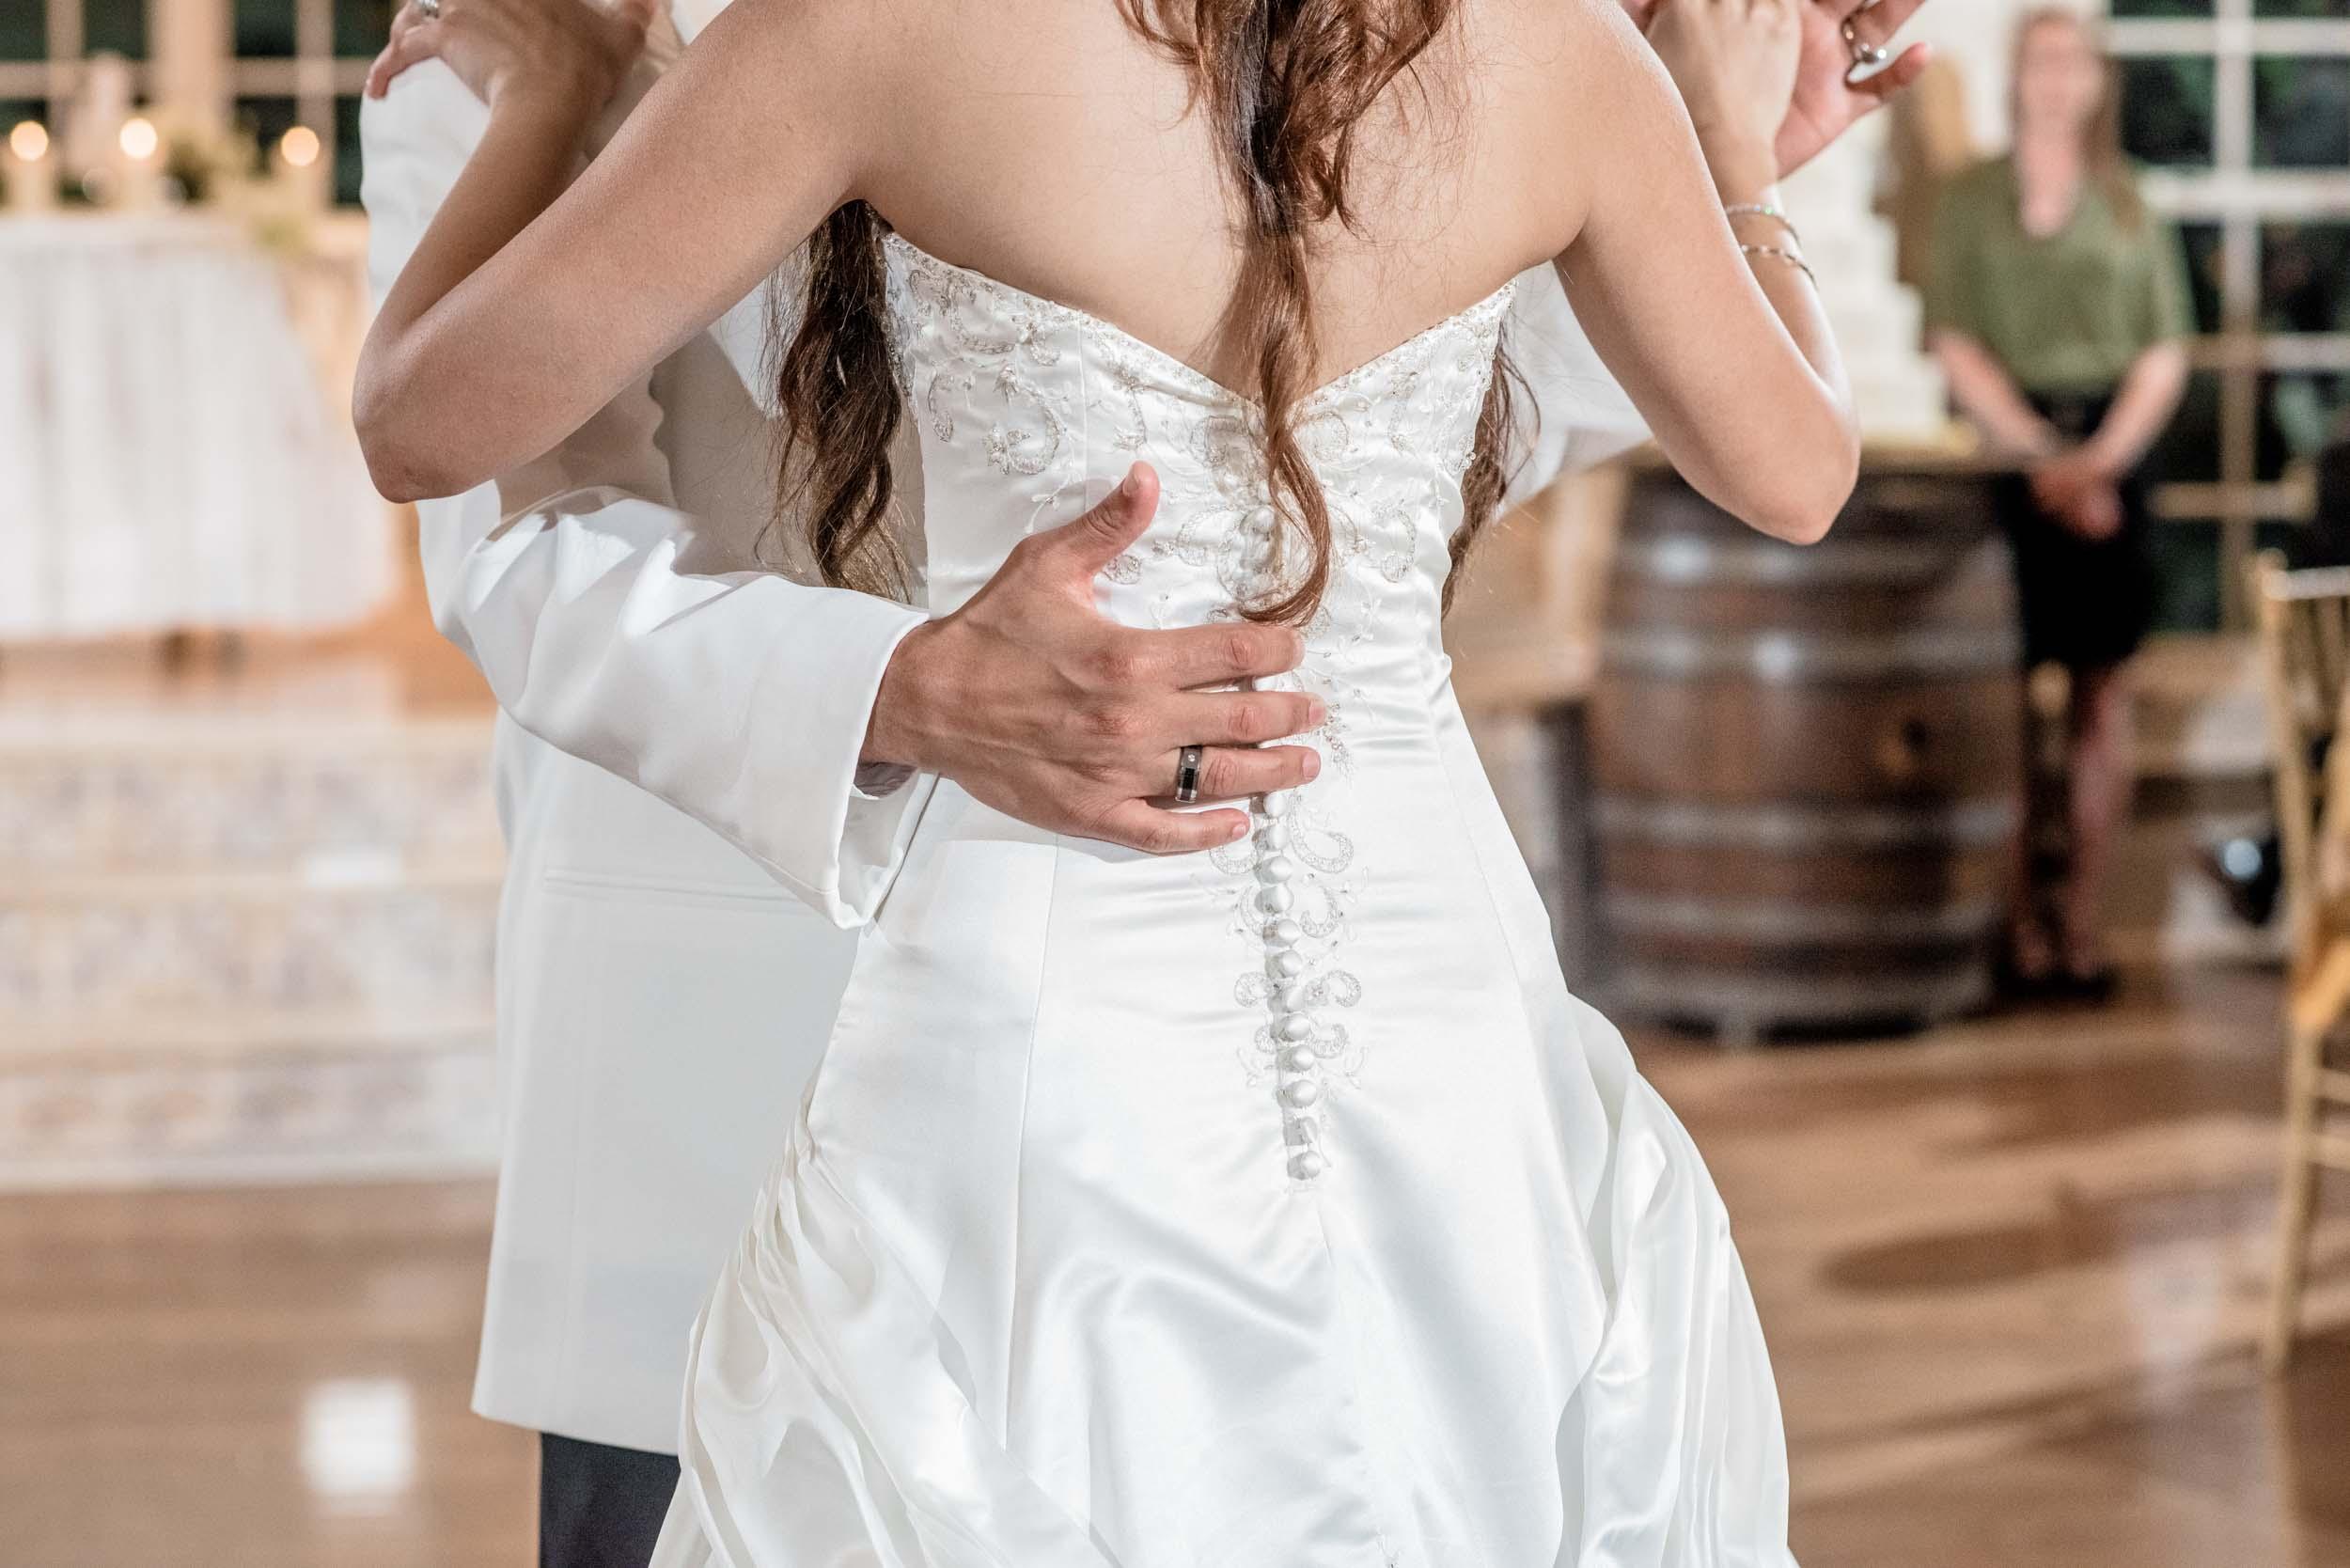 dc+metro+wedding+photographer+vadym+guliuk+photography+wedding+first+dance-2024.jpg